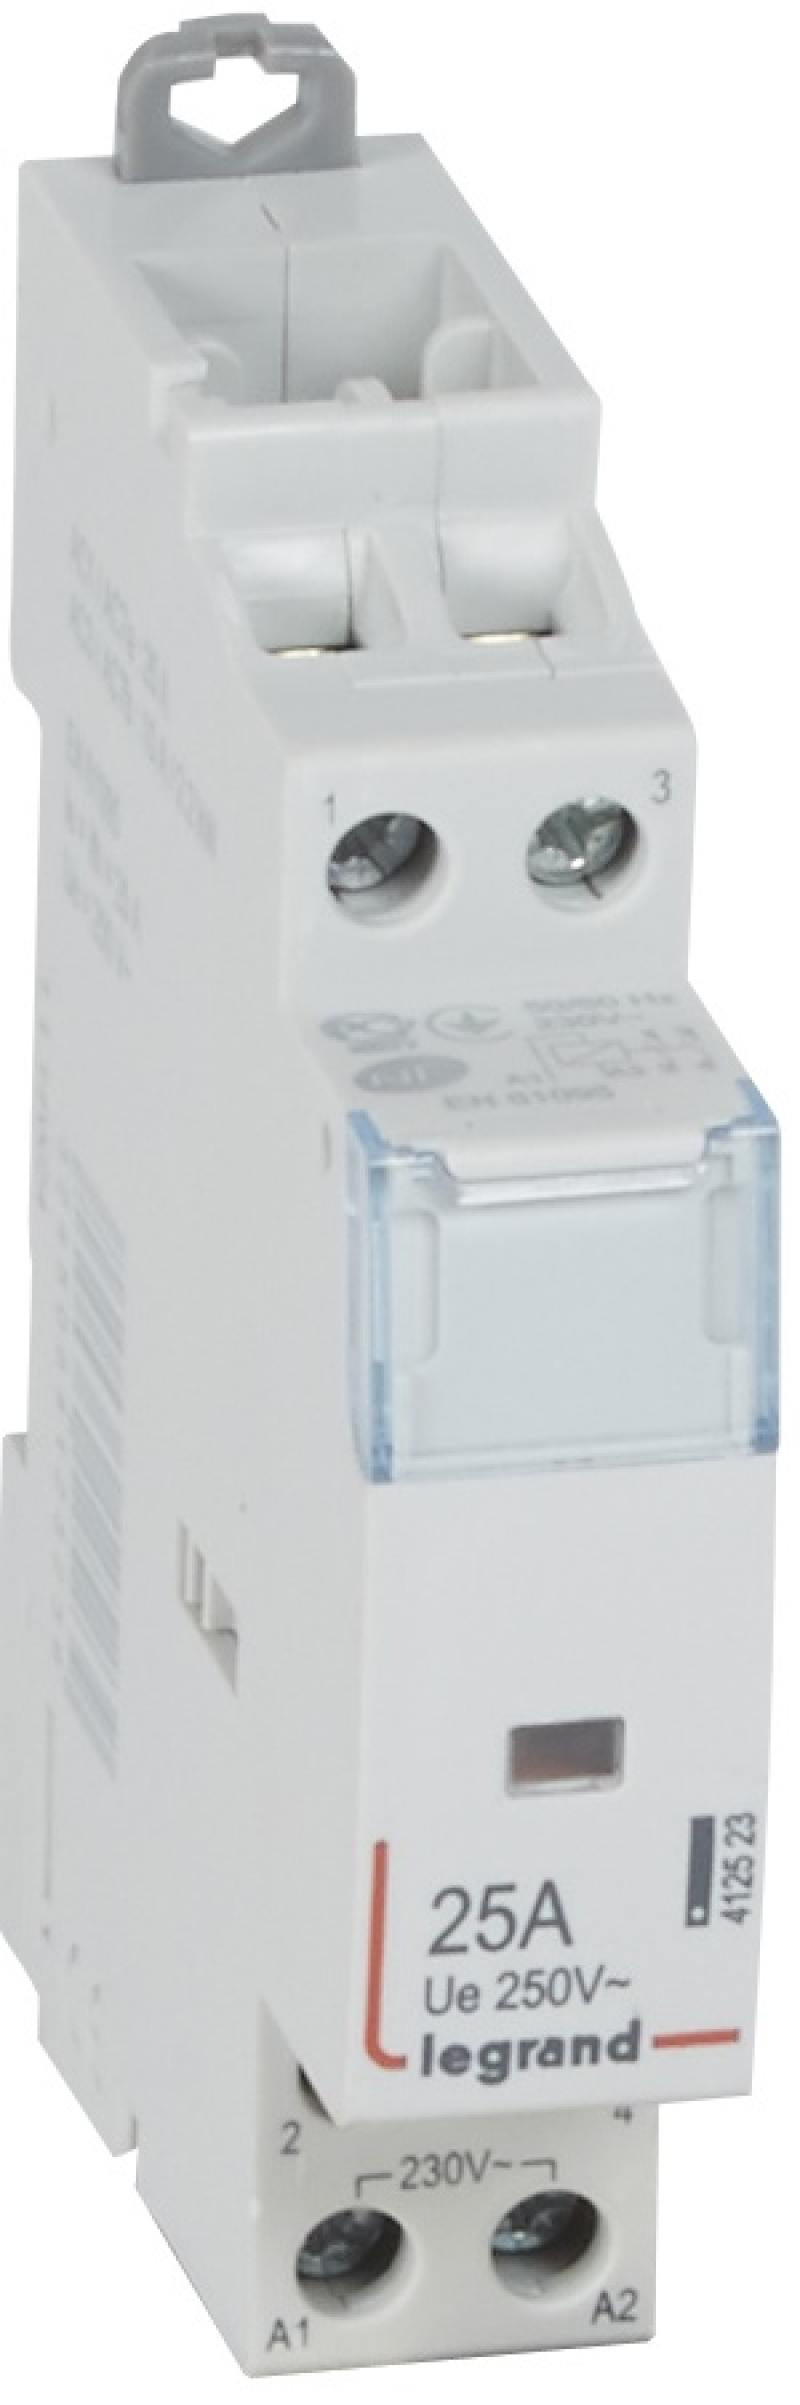 Контактор Legrand CX3 230V 2НО 25А 412523 sennheiser cx 3 00 шумоизолирующие наушники white